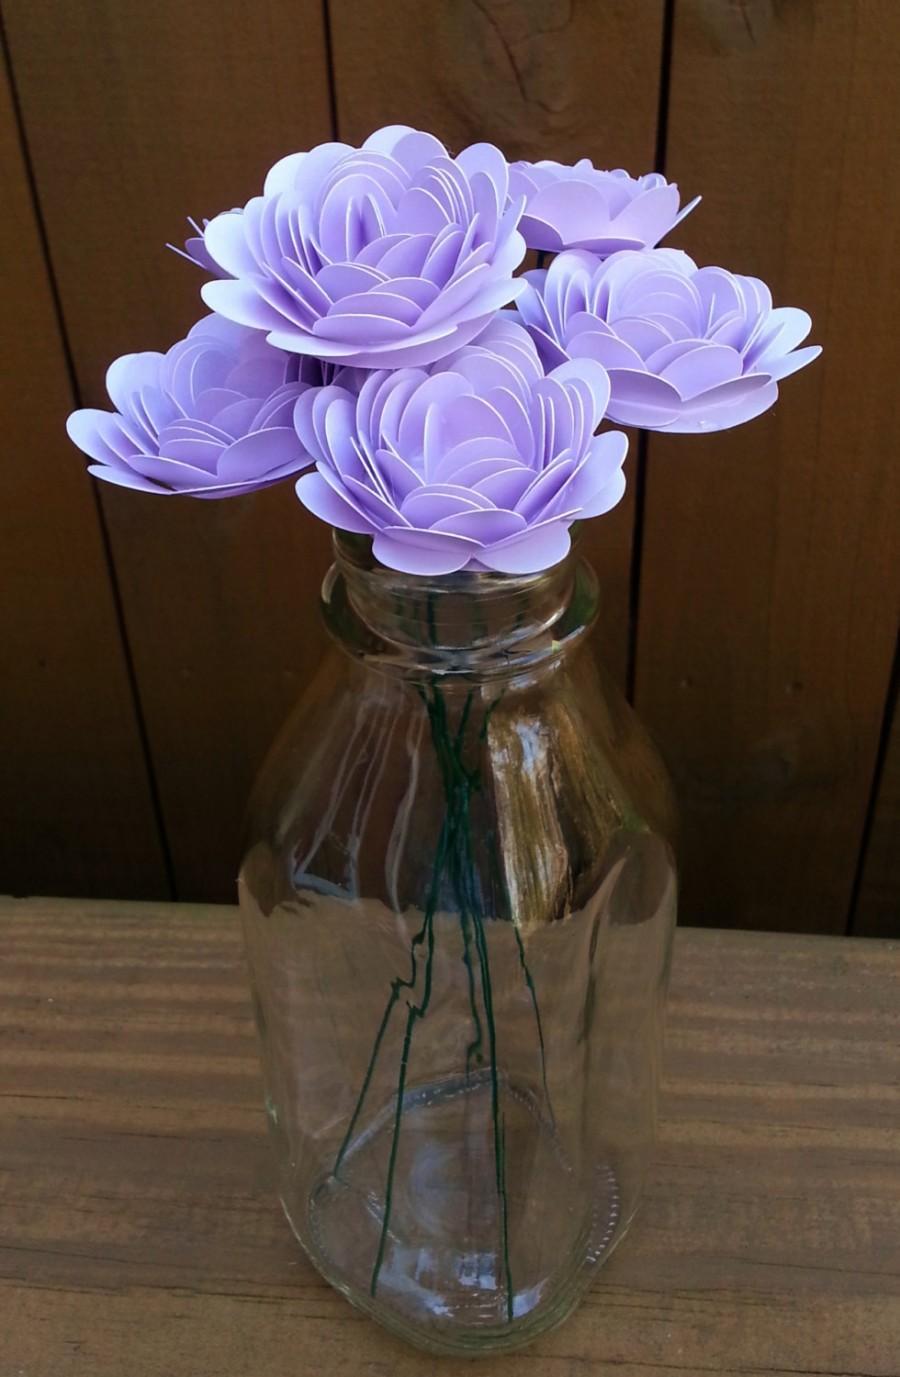 Paper Flower Bouquet 6 Small Lavender Purple Mums Handmade Paper